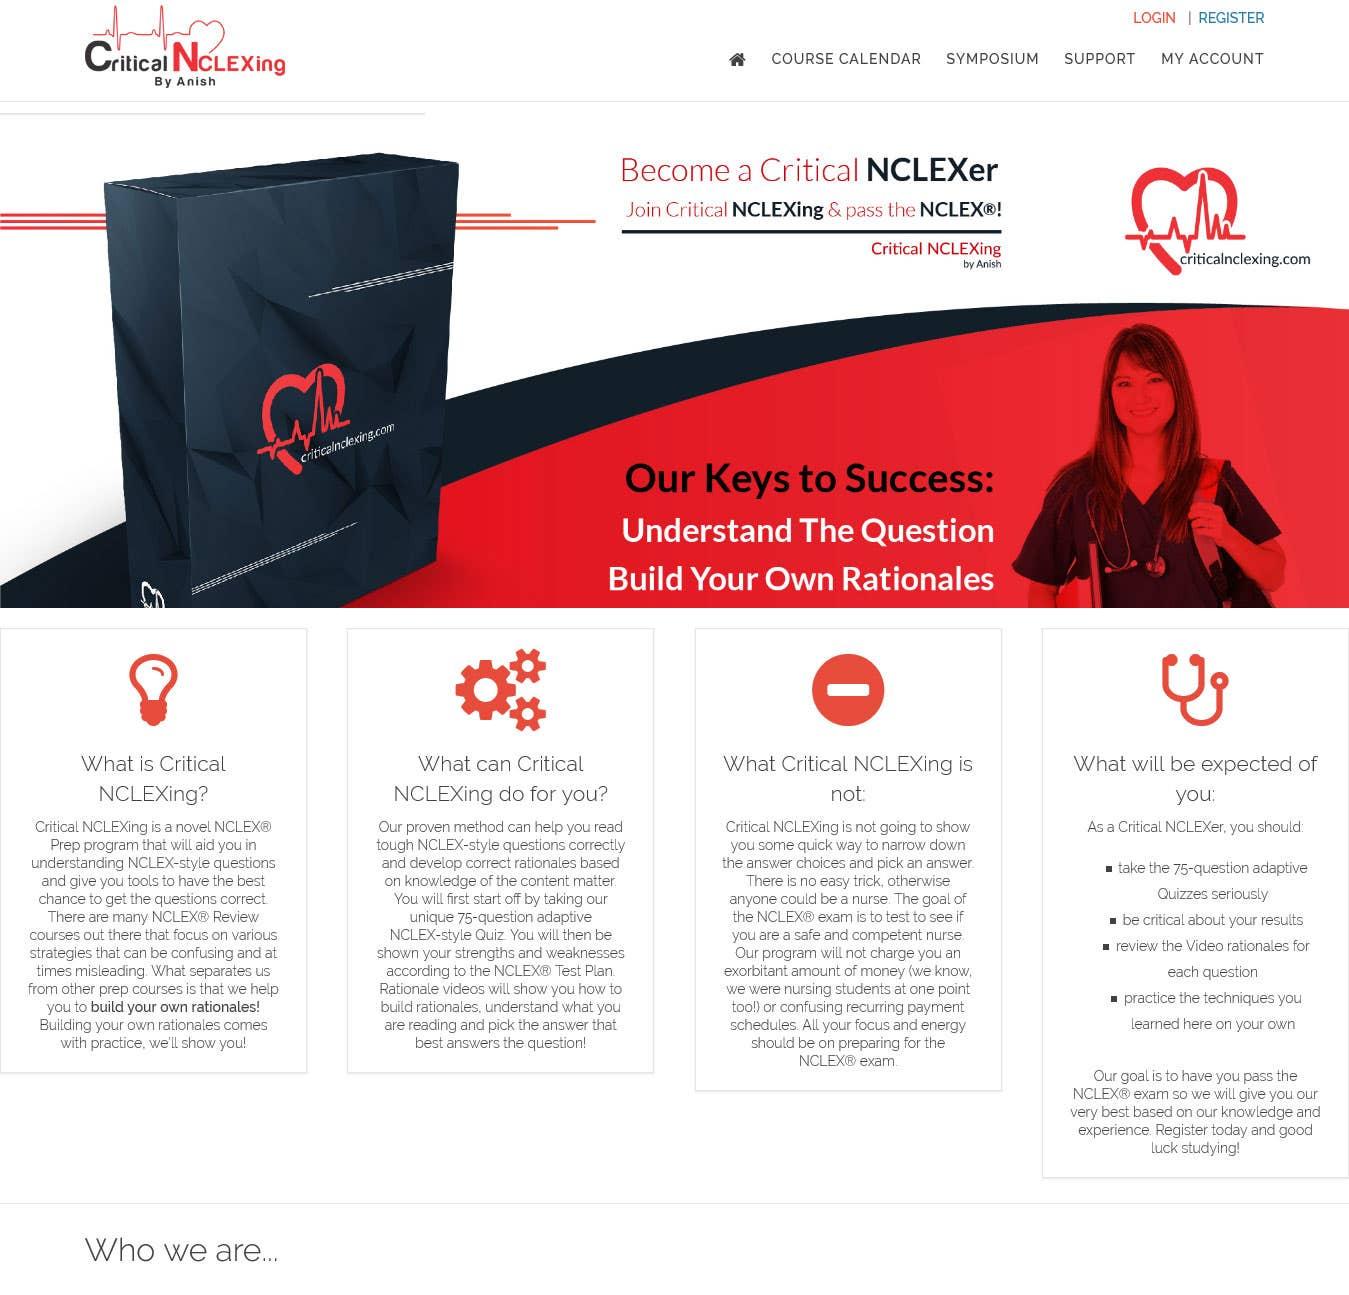 Online Courses, Quizzes & Examinations